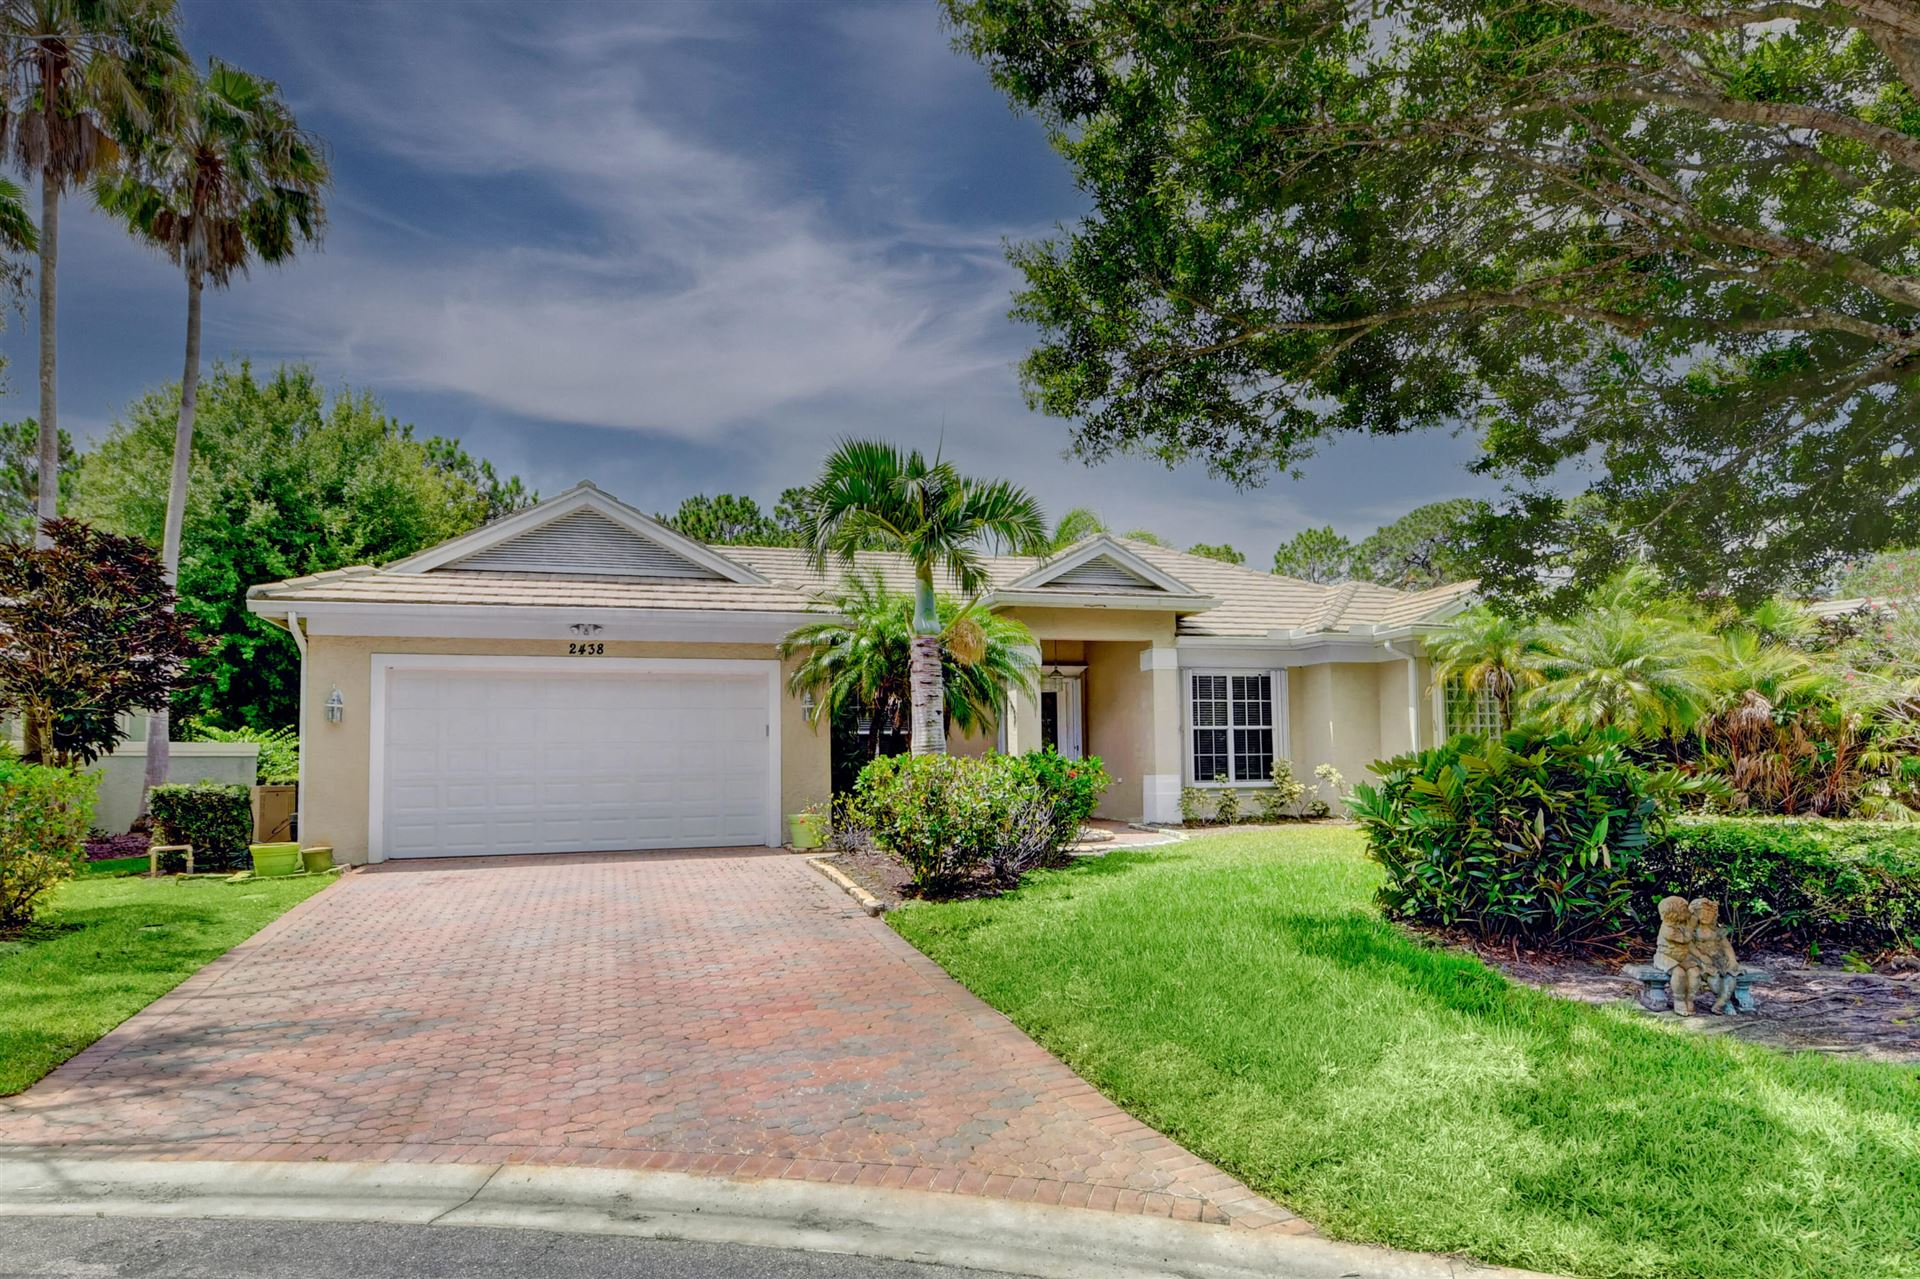 2438 SW Carriage Place, Palm City, FL 34990 - MLS#: RX-10722821